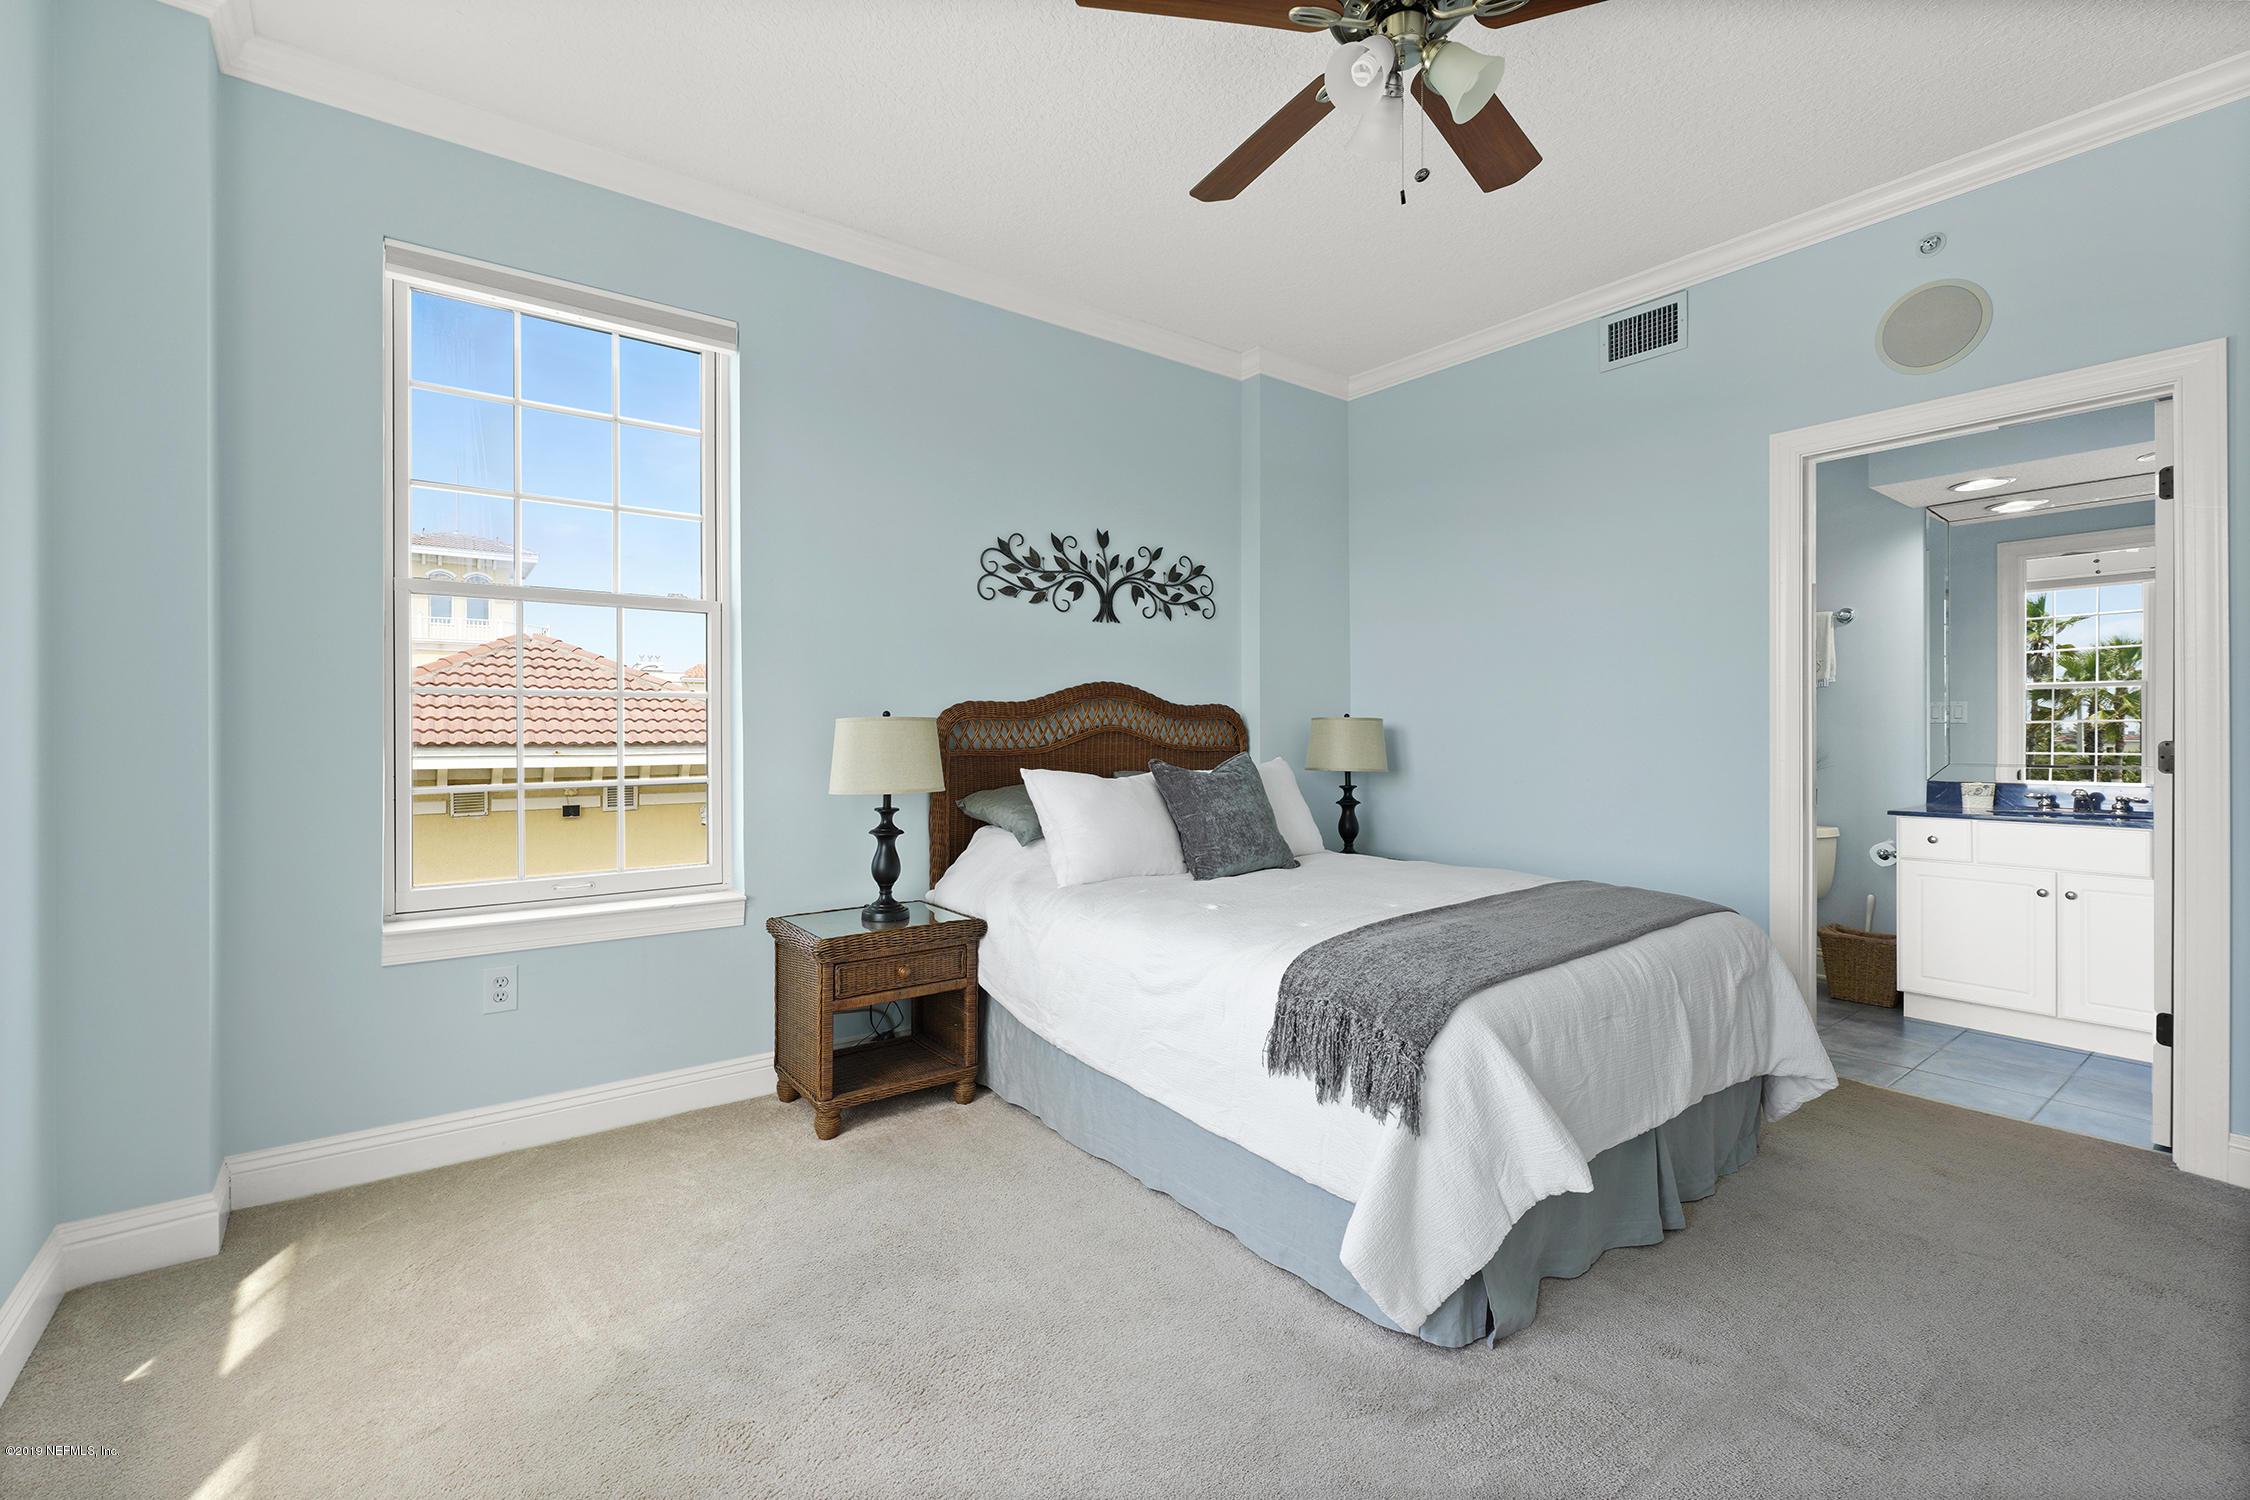 110 SERENATA, PONTE VEDRA BEACH, FLORIDA 32082, 4 Bedrooms Bedrooms, ,3 BathroomsBathrooms,Condo,For sale,SERENATA,1019534